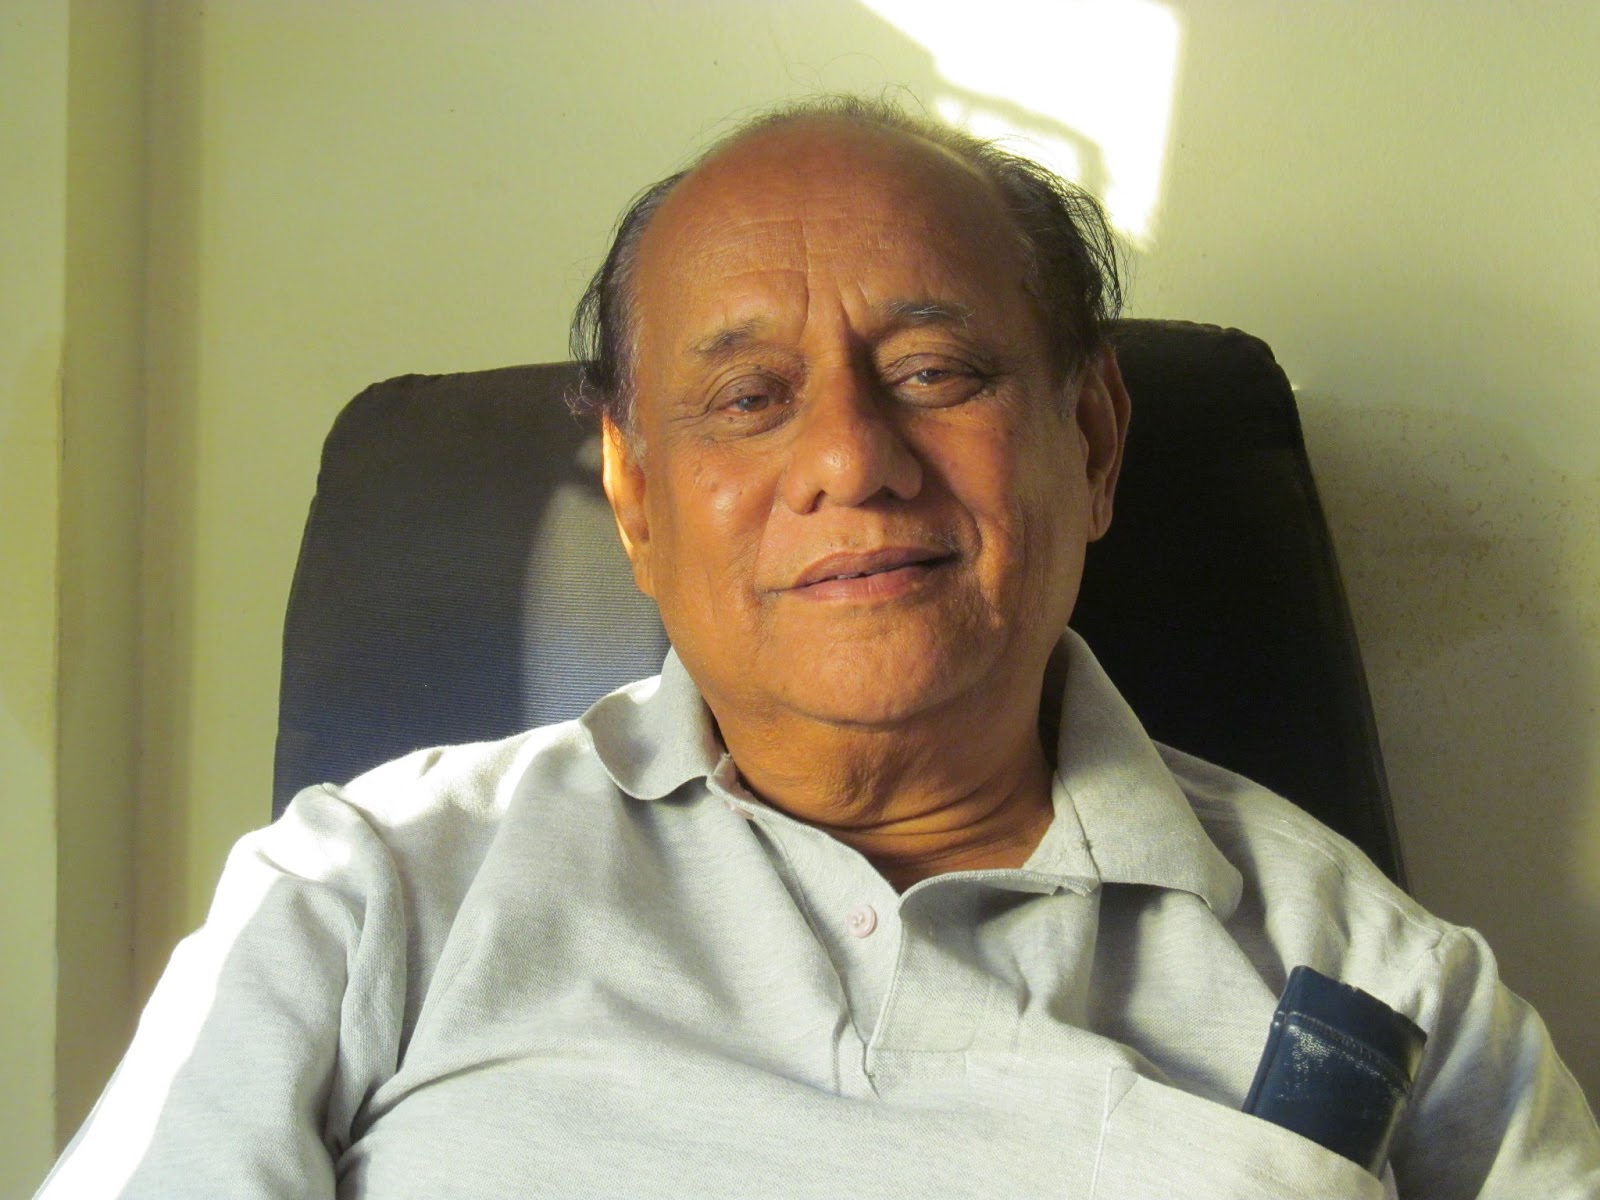 Chandrakant Pathak - Photo taken on 7 Mar 2013 5:45 pm by Sanjay Kelkar - IMG_1180